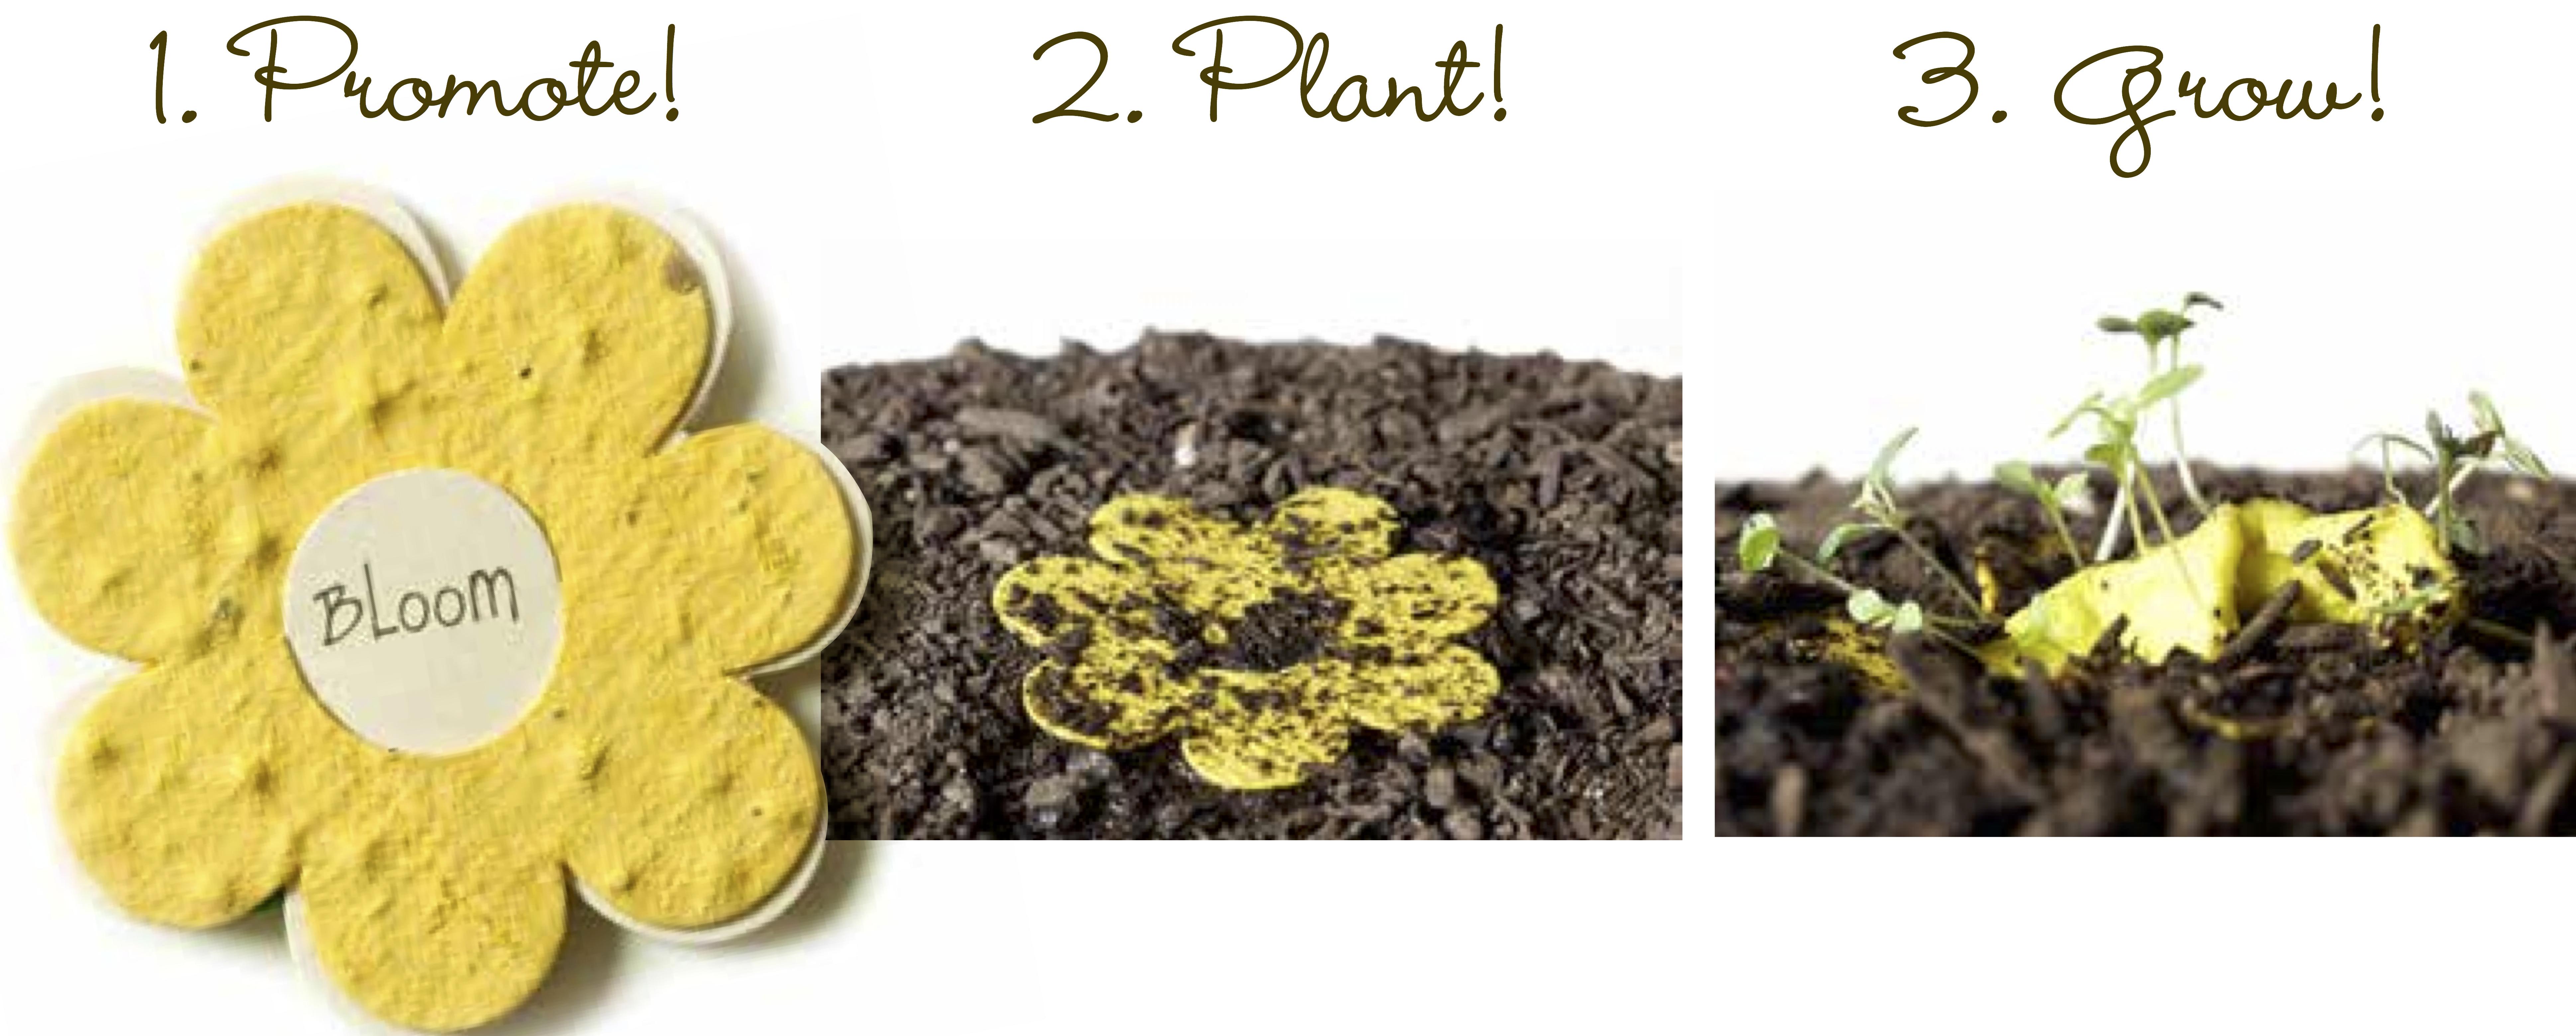 Organic plantable seeded paper plantablecards promoteplantgrow mightylinksfo